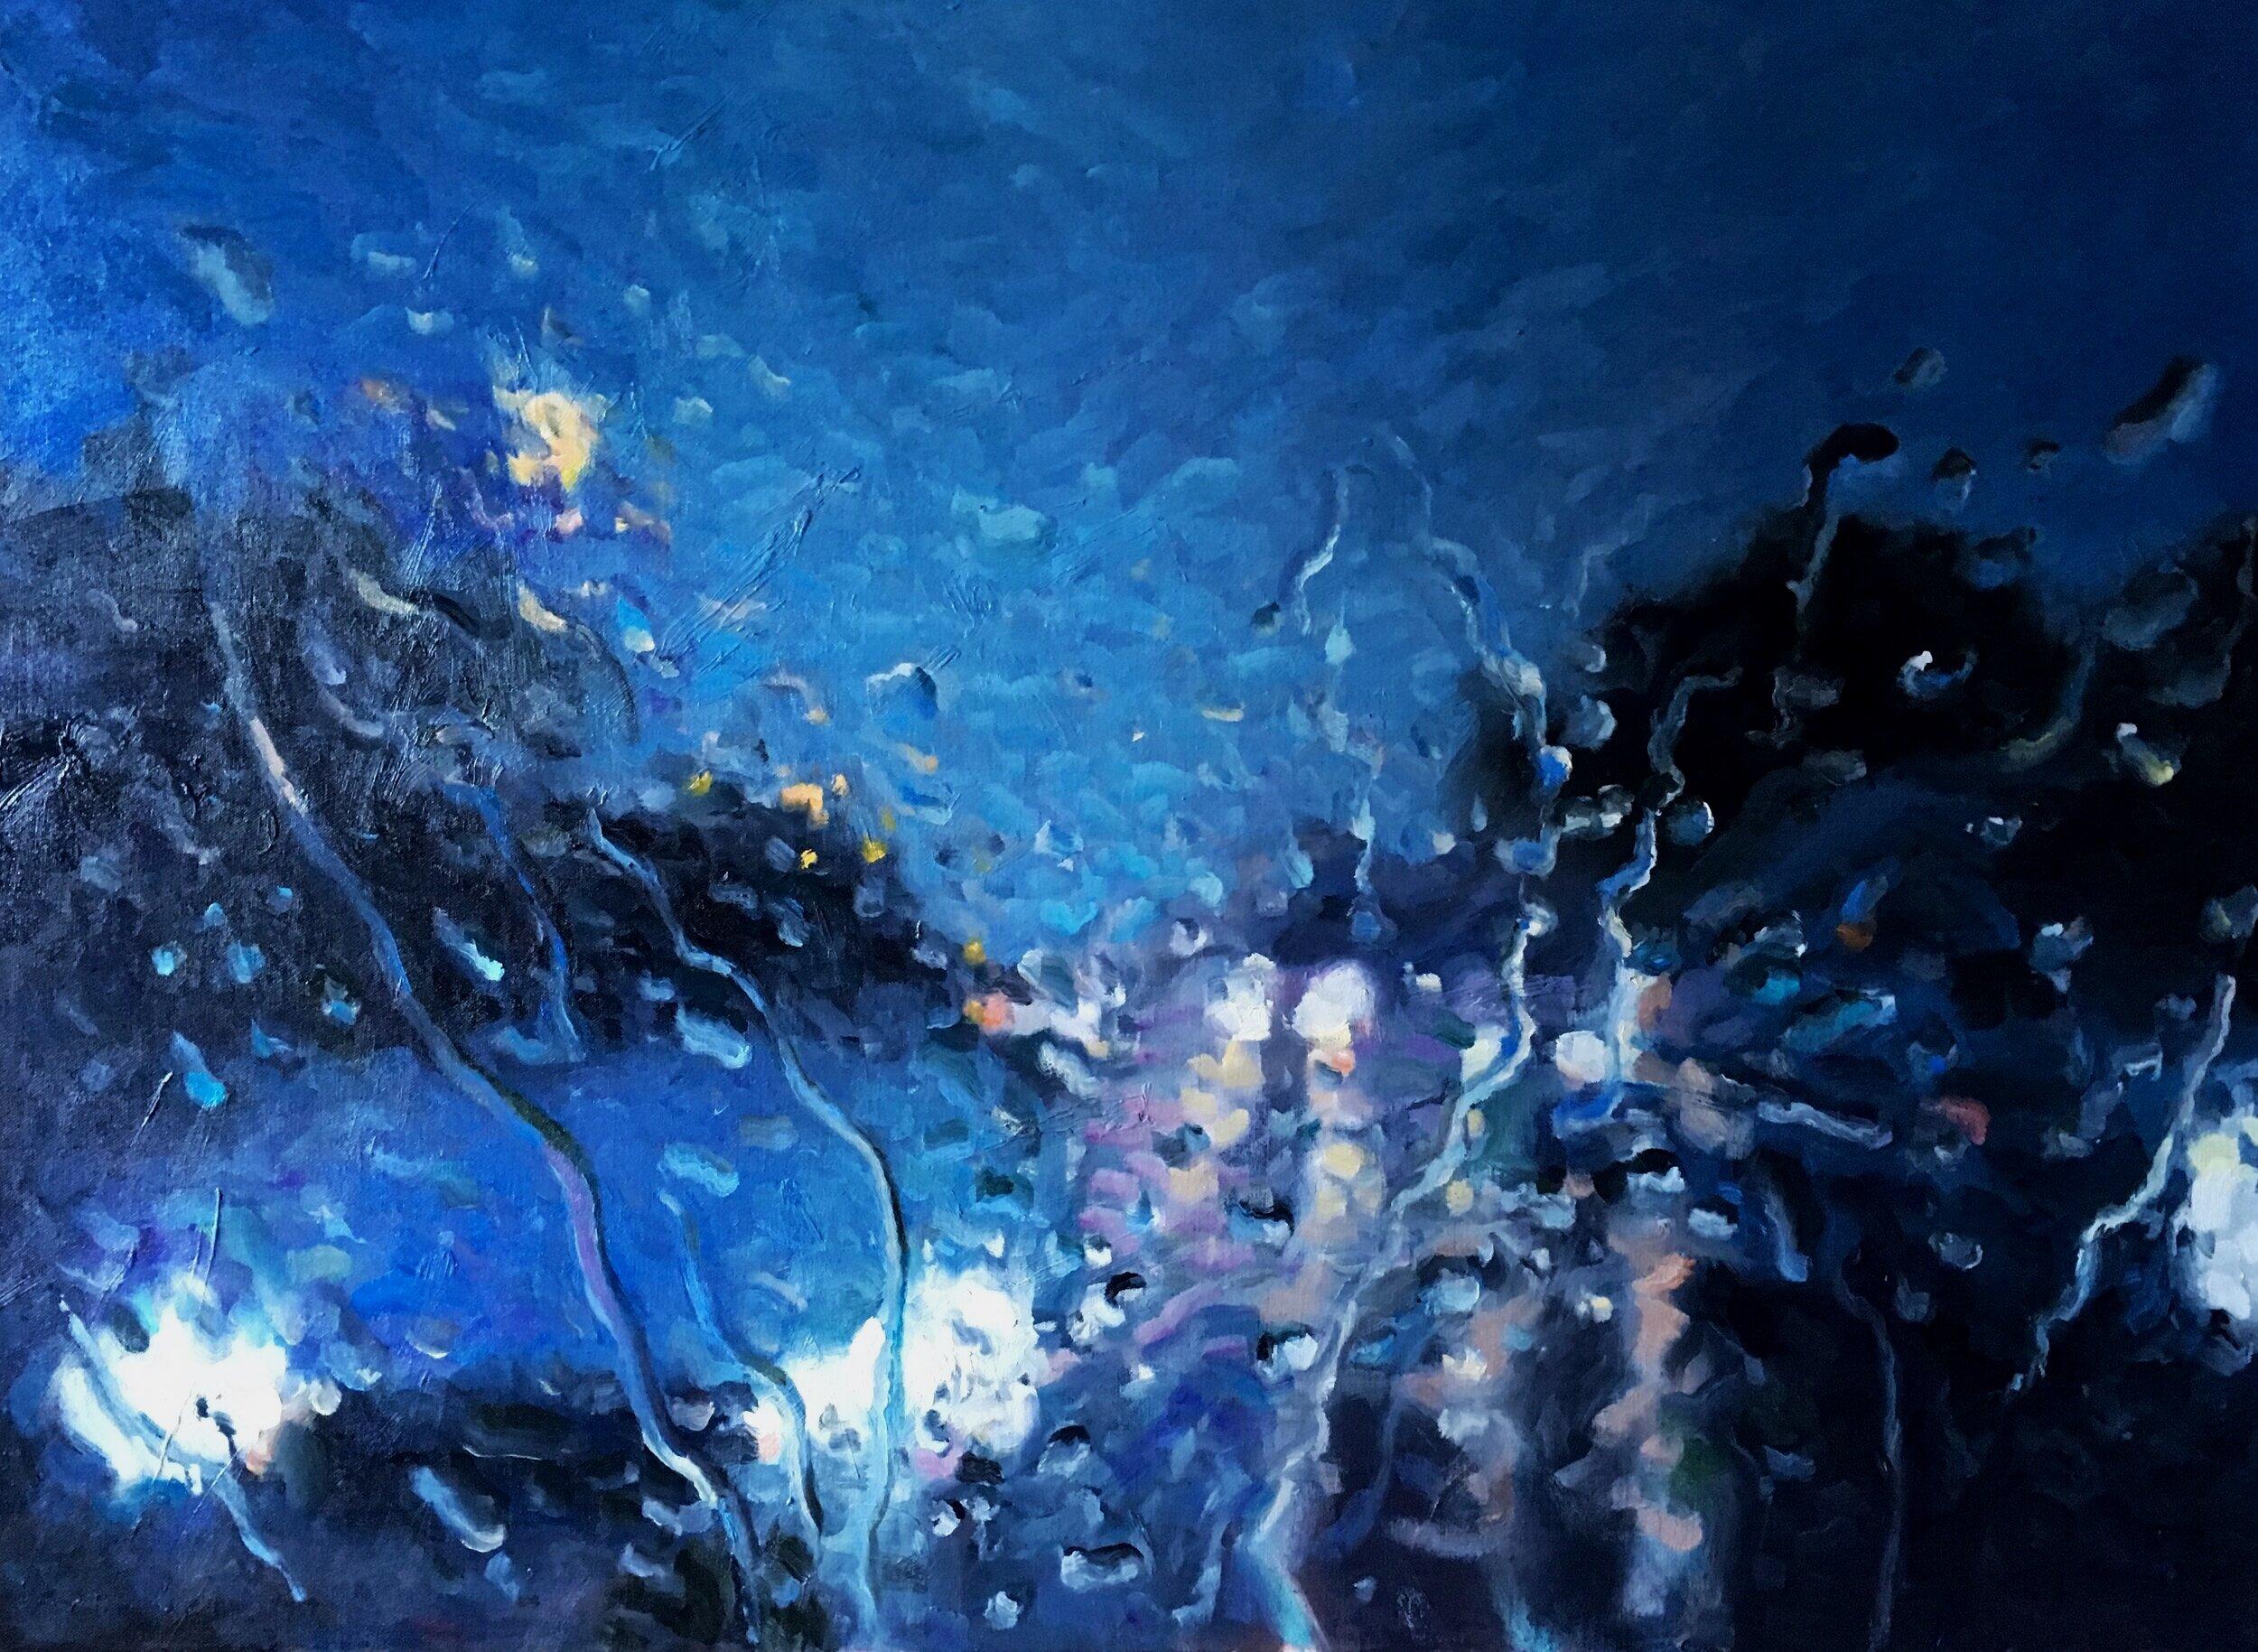 RAIN # 11